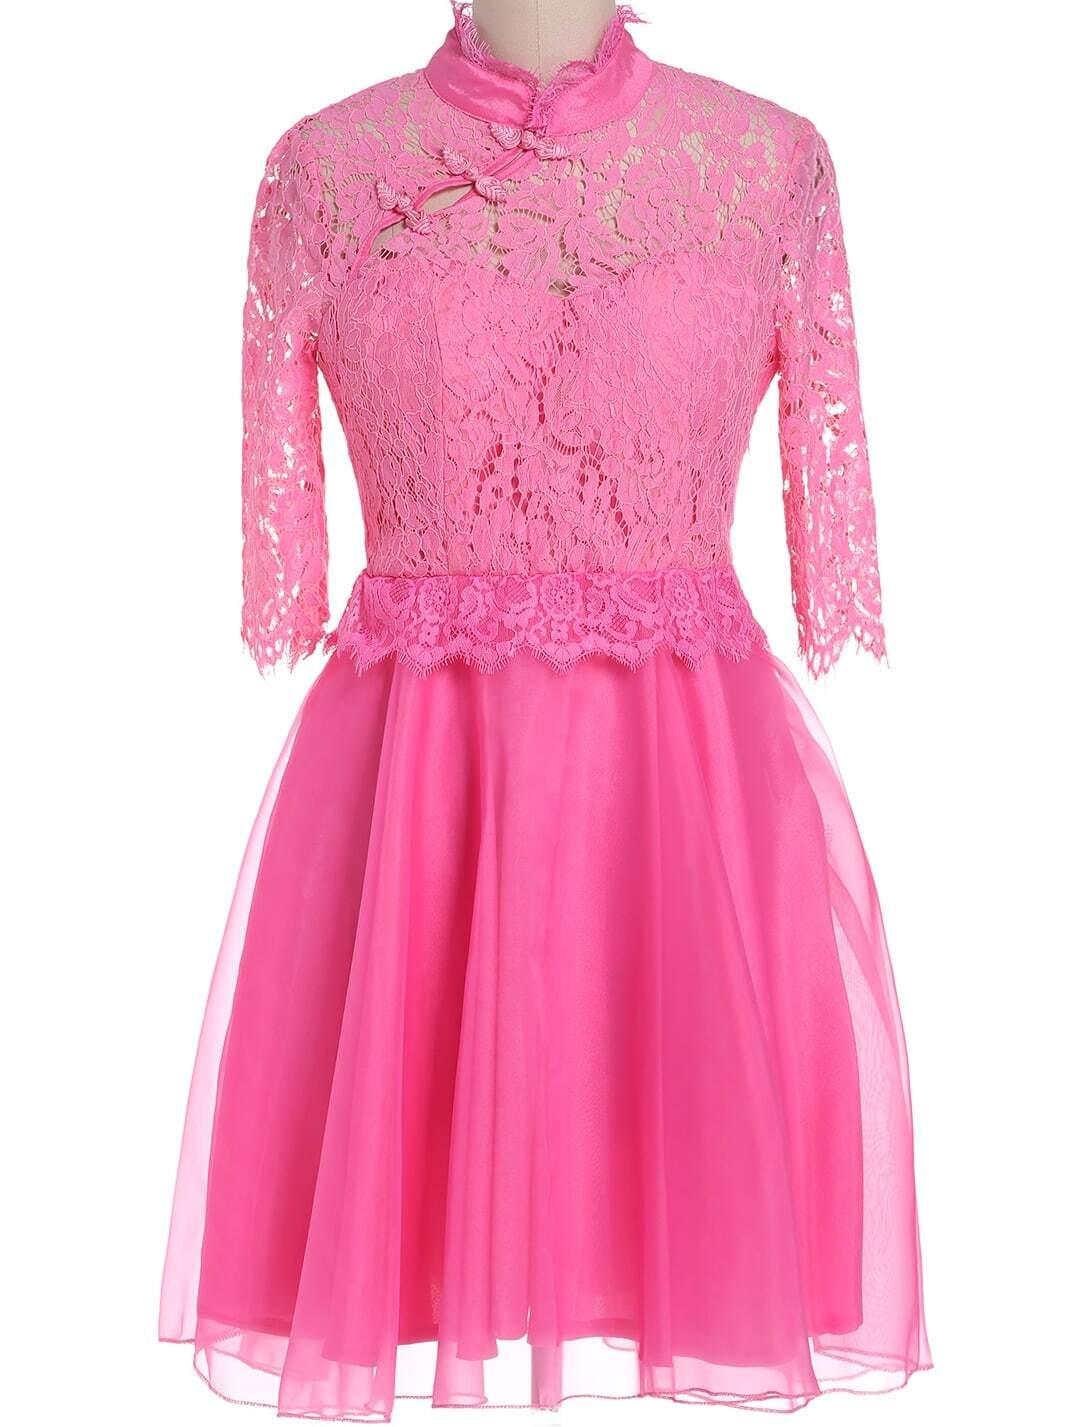 Pink Stand Collar Half Sleeve Lace Chiffon Dress